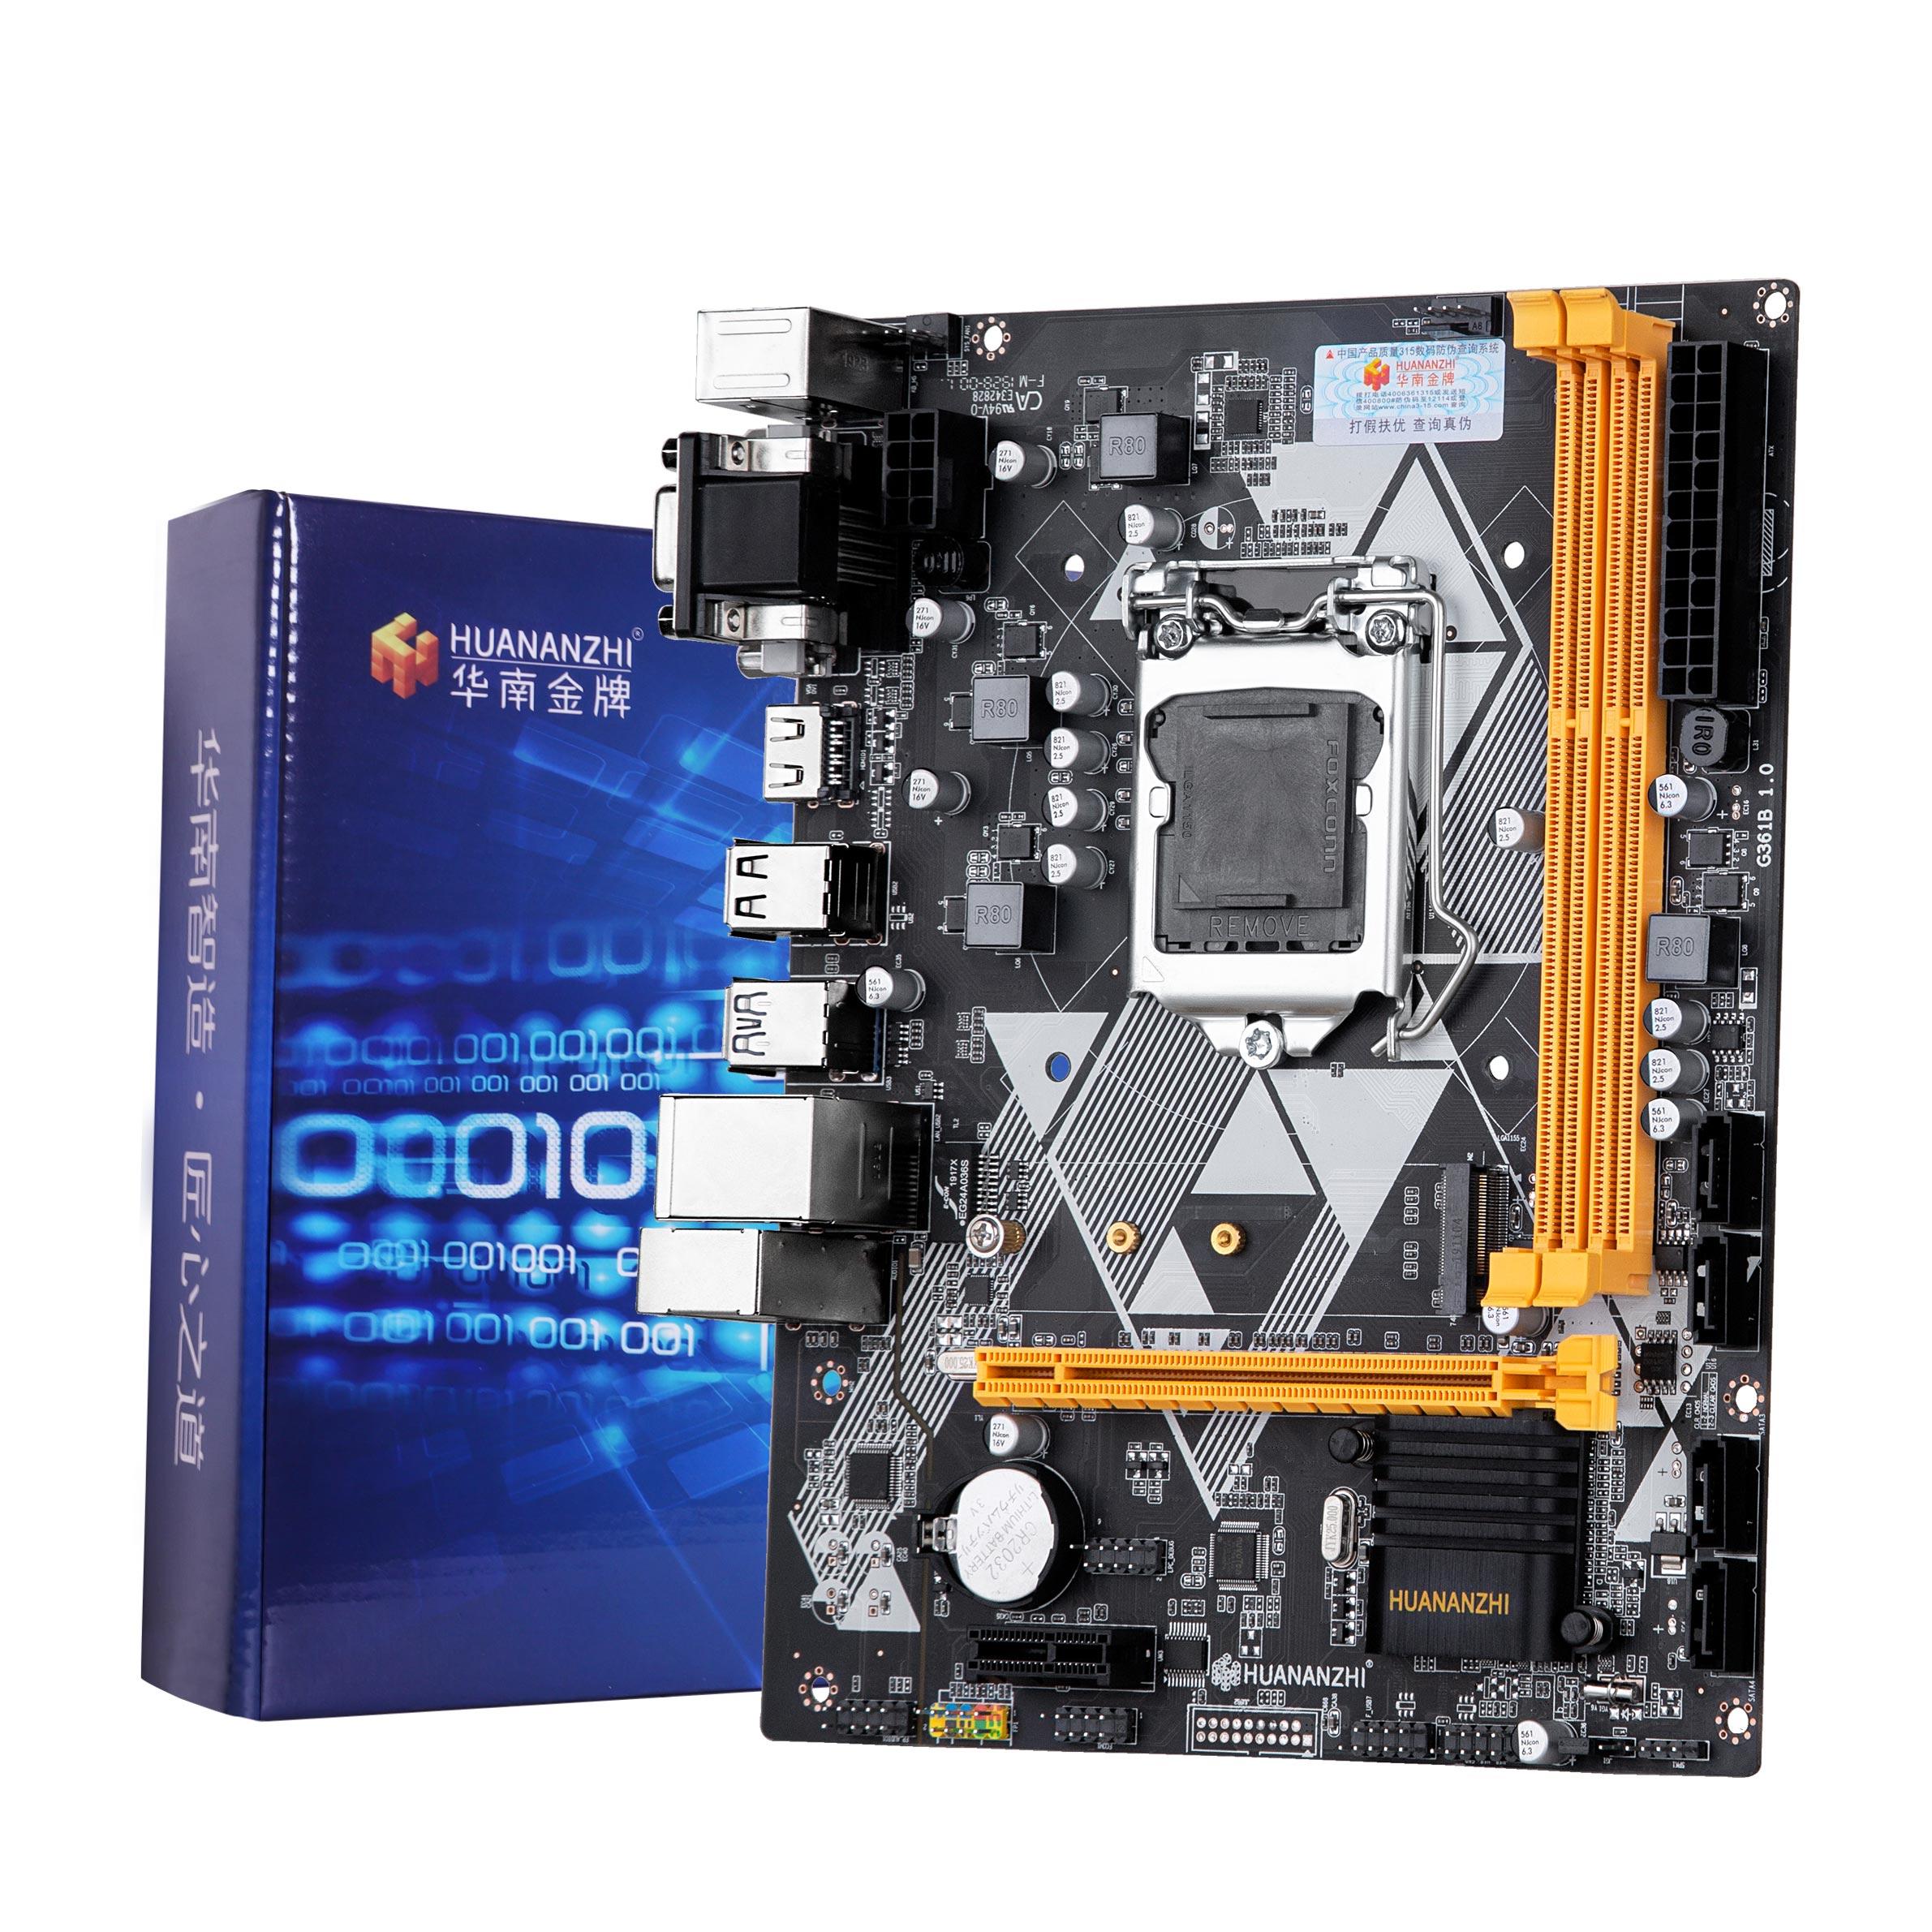 Huanzhi-اللوحة الأم B85 LGA1150 ، مع فتحة M.2 NVMe SSD ، مخرج VGA/HDMI/DVI ، SATA3.0 ، شراء كمبيوتر جيد